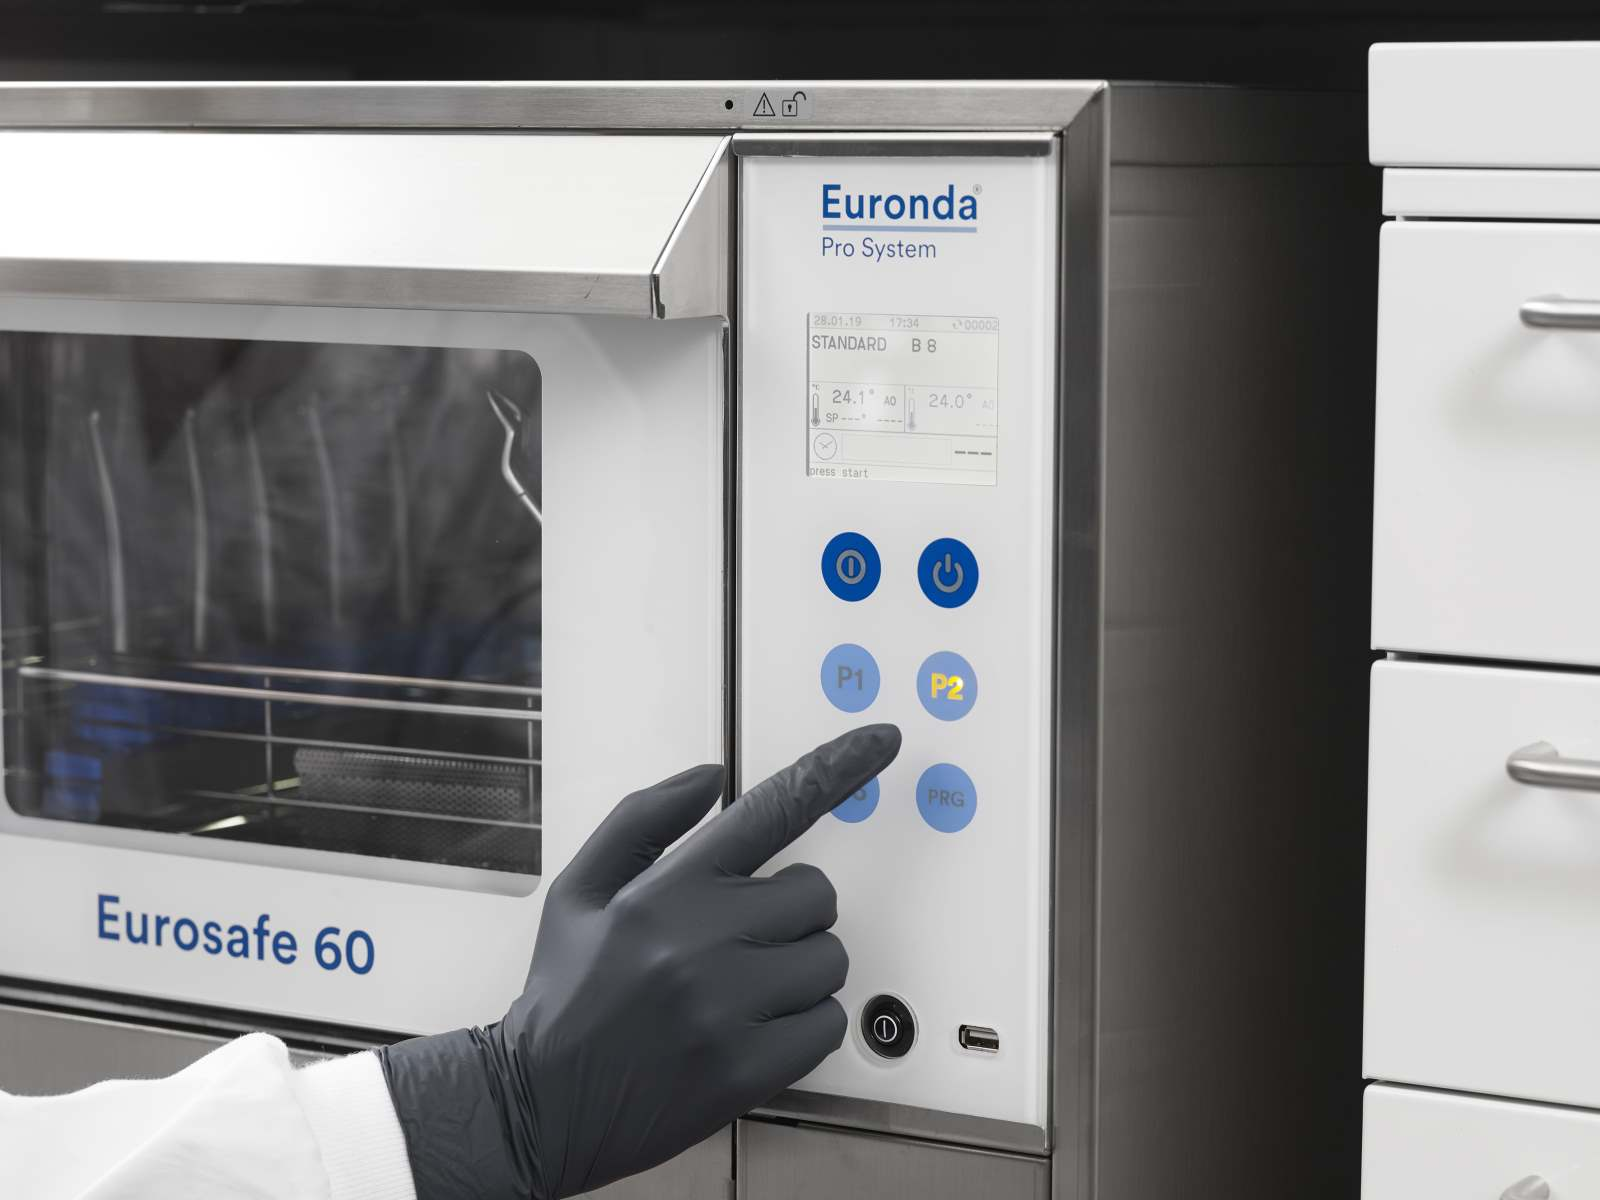 Eurosafe 60 Thermodesinfektor Bedienung